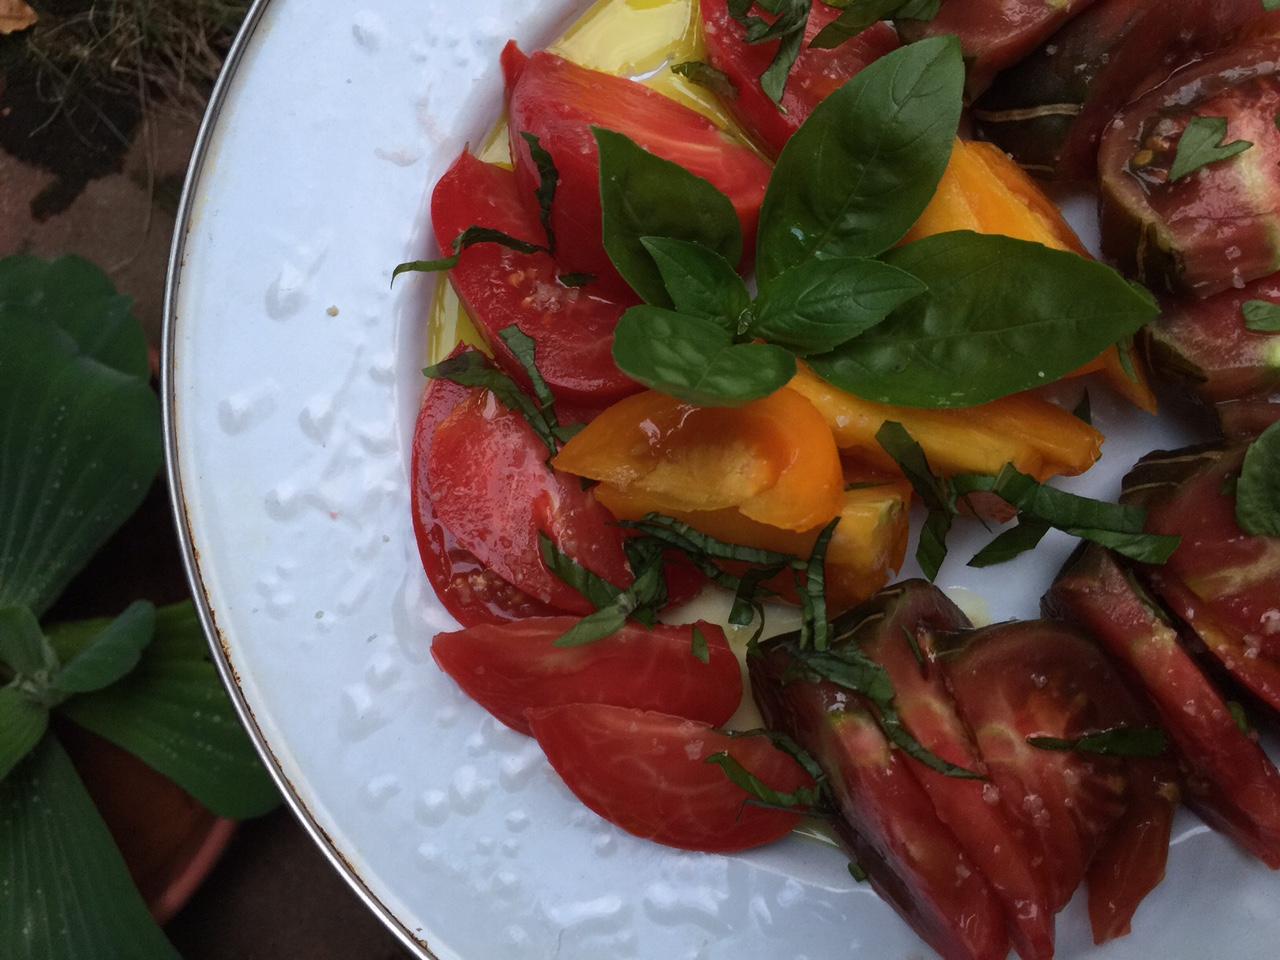 Tomato taste test: black prince heirloom is my favorite.